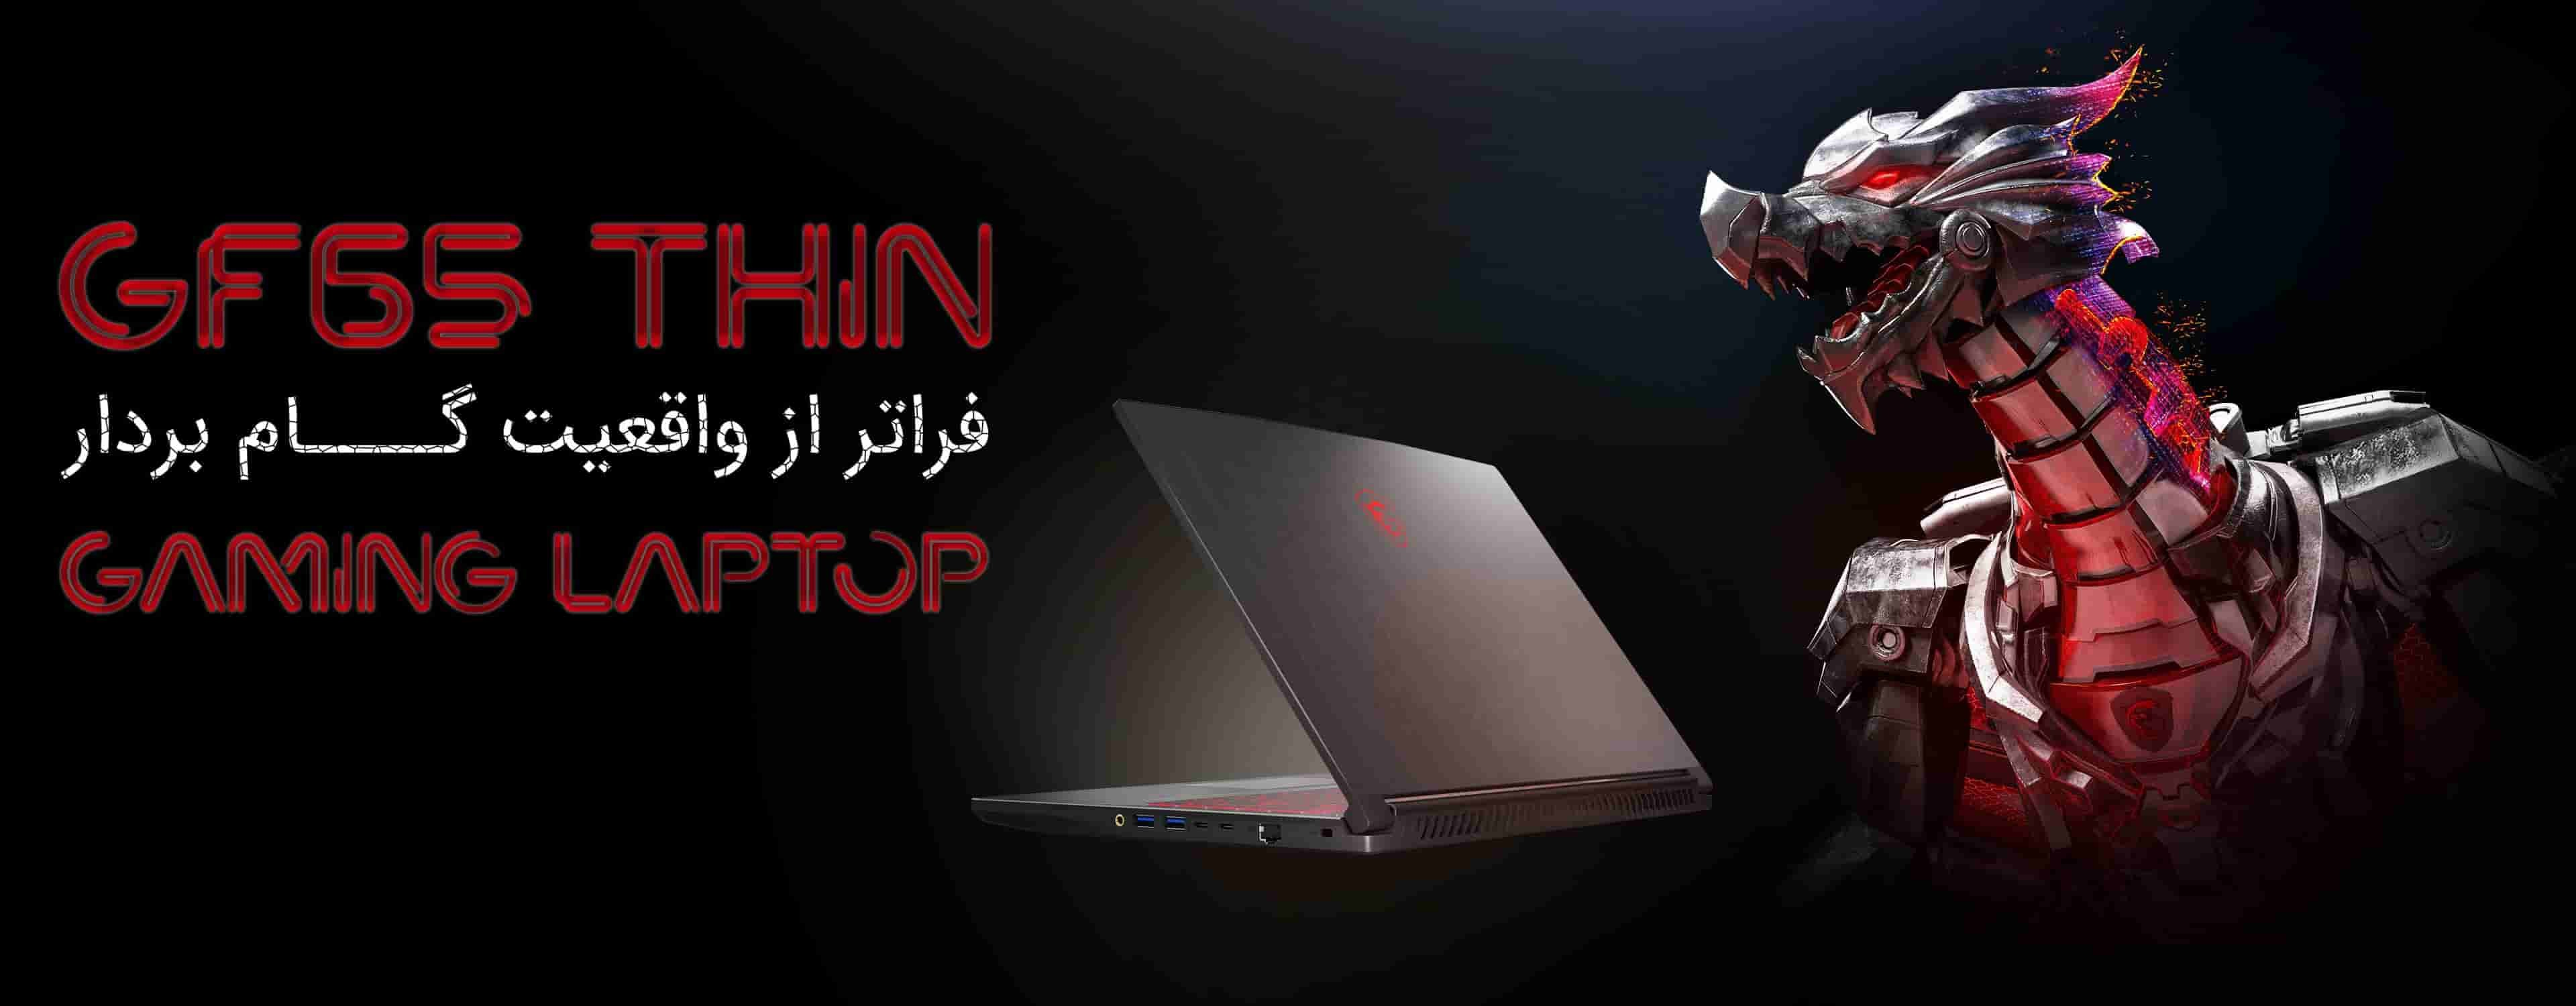 لپ تاپ GF65 Thin 10SCSXR